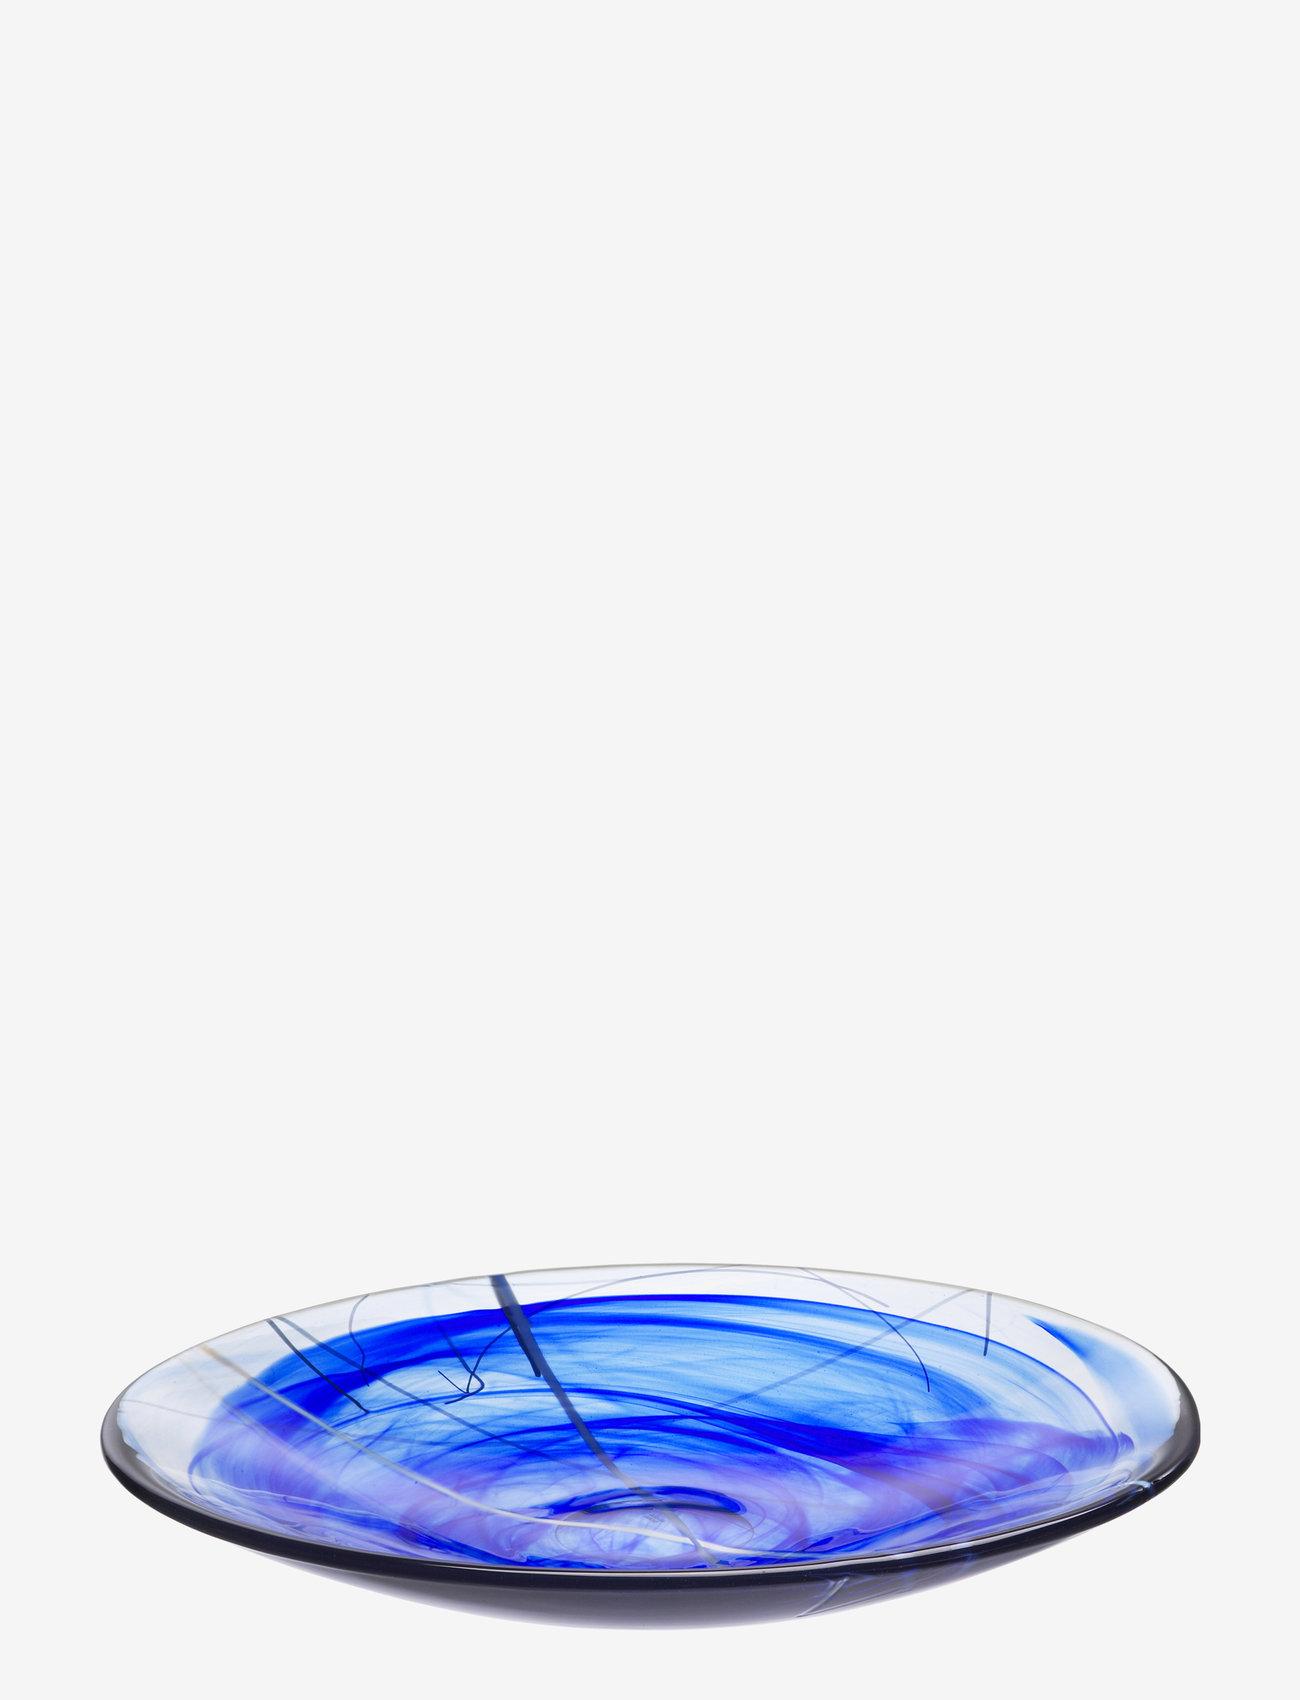 Kosta Boda - CONTRAST BLUE DISH D 380MM - tarjoiluastiat ja -lautaset - blue - 0